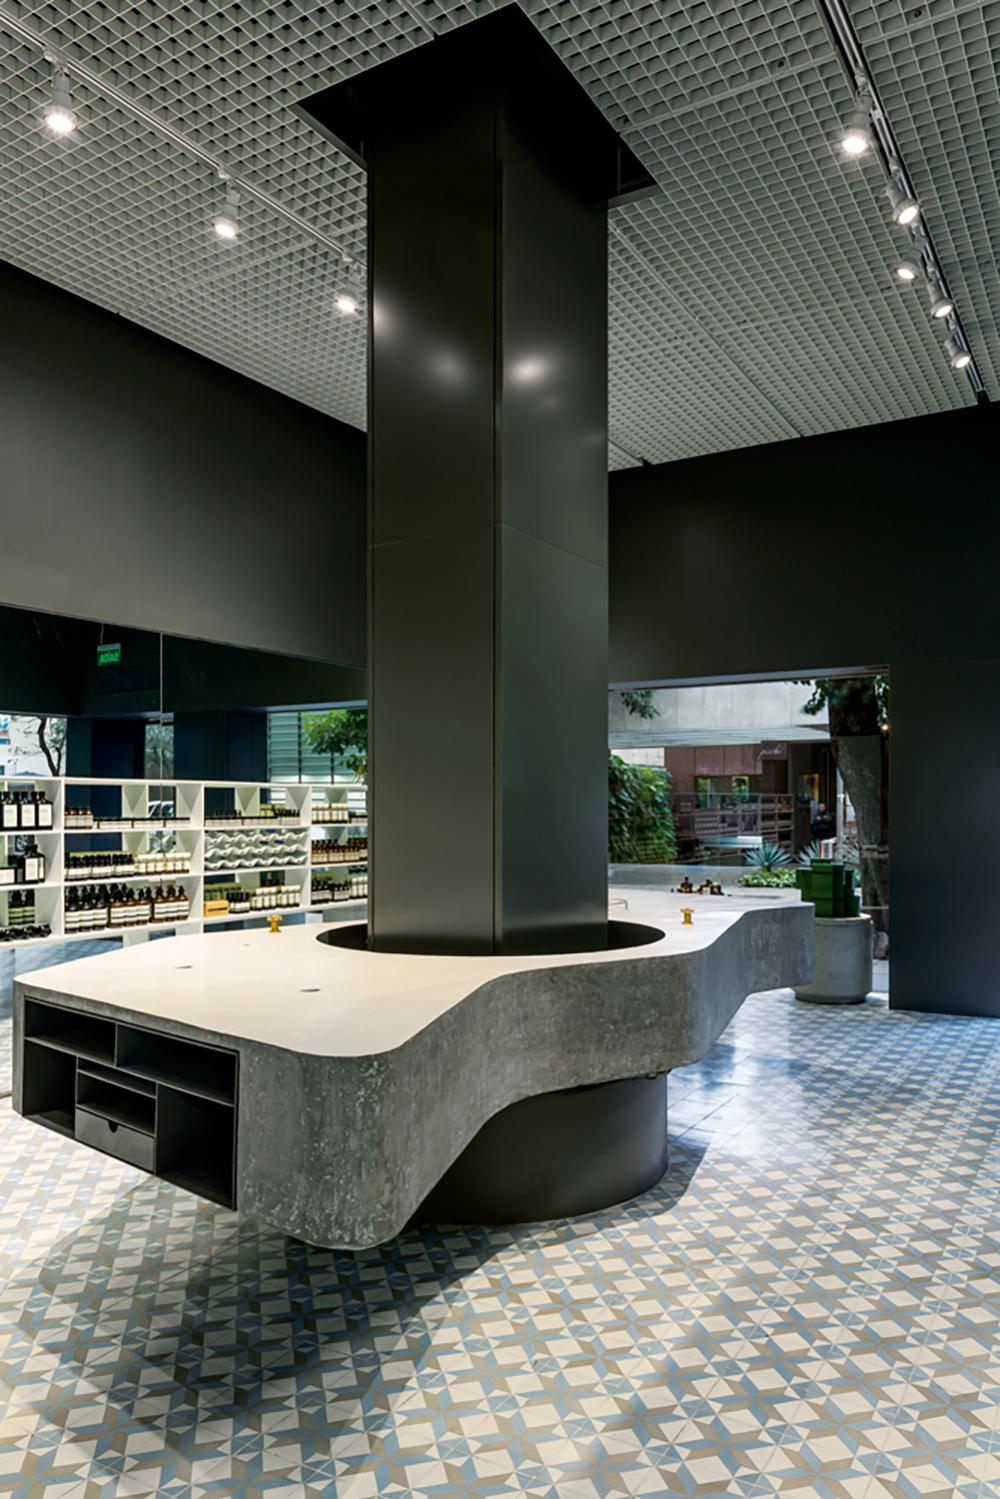 AESOP / Metro Arquitetos Associados + Paulo Mendes da